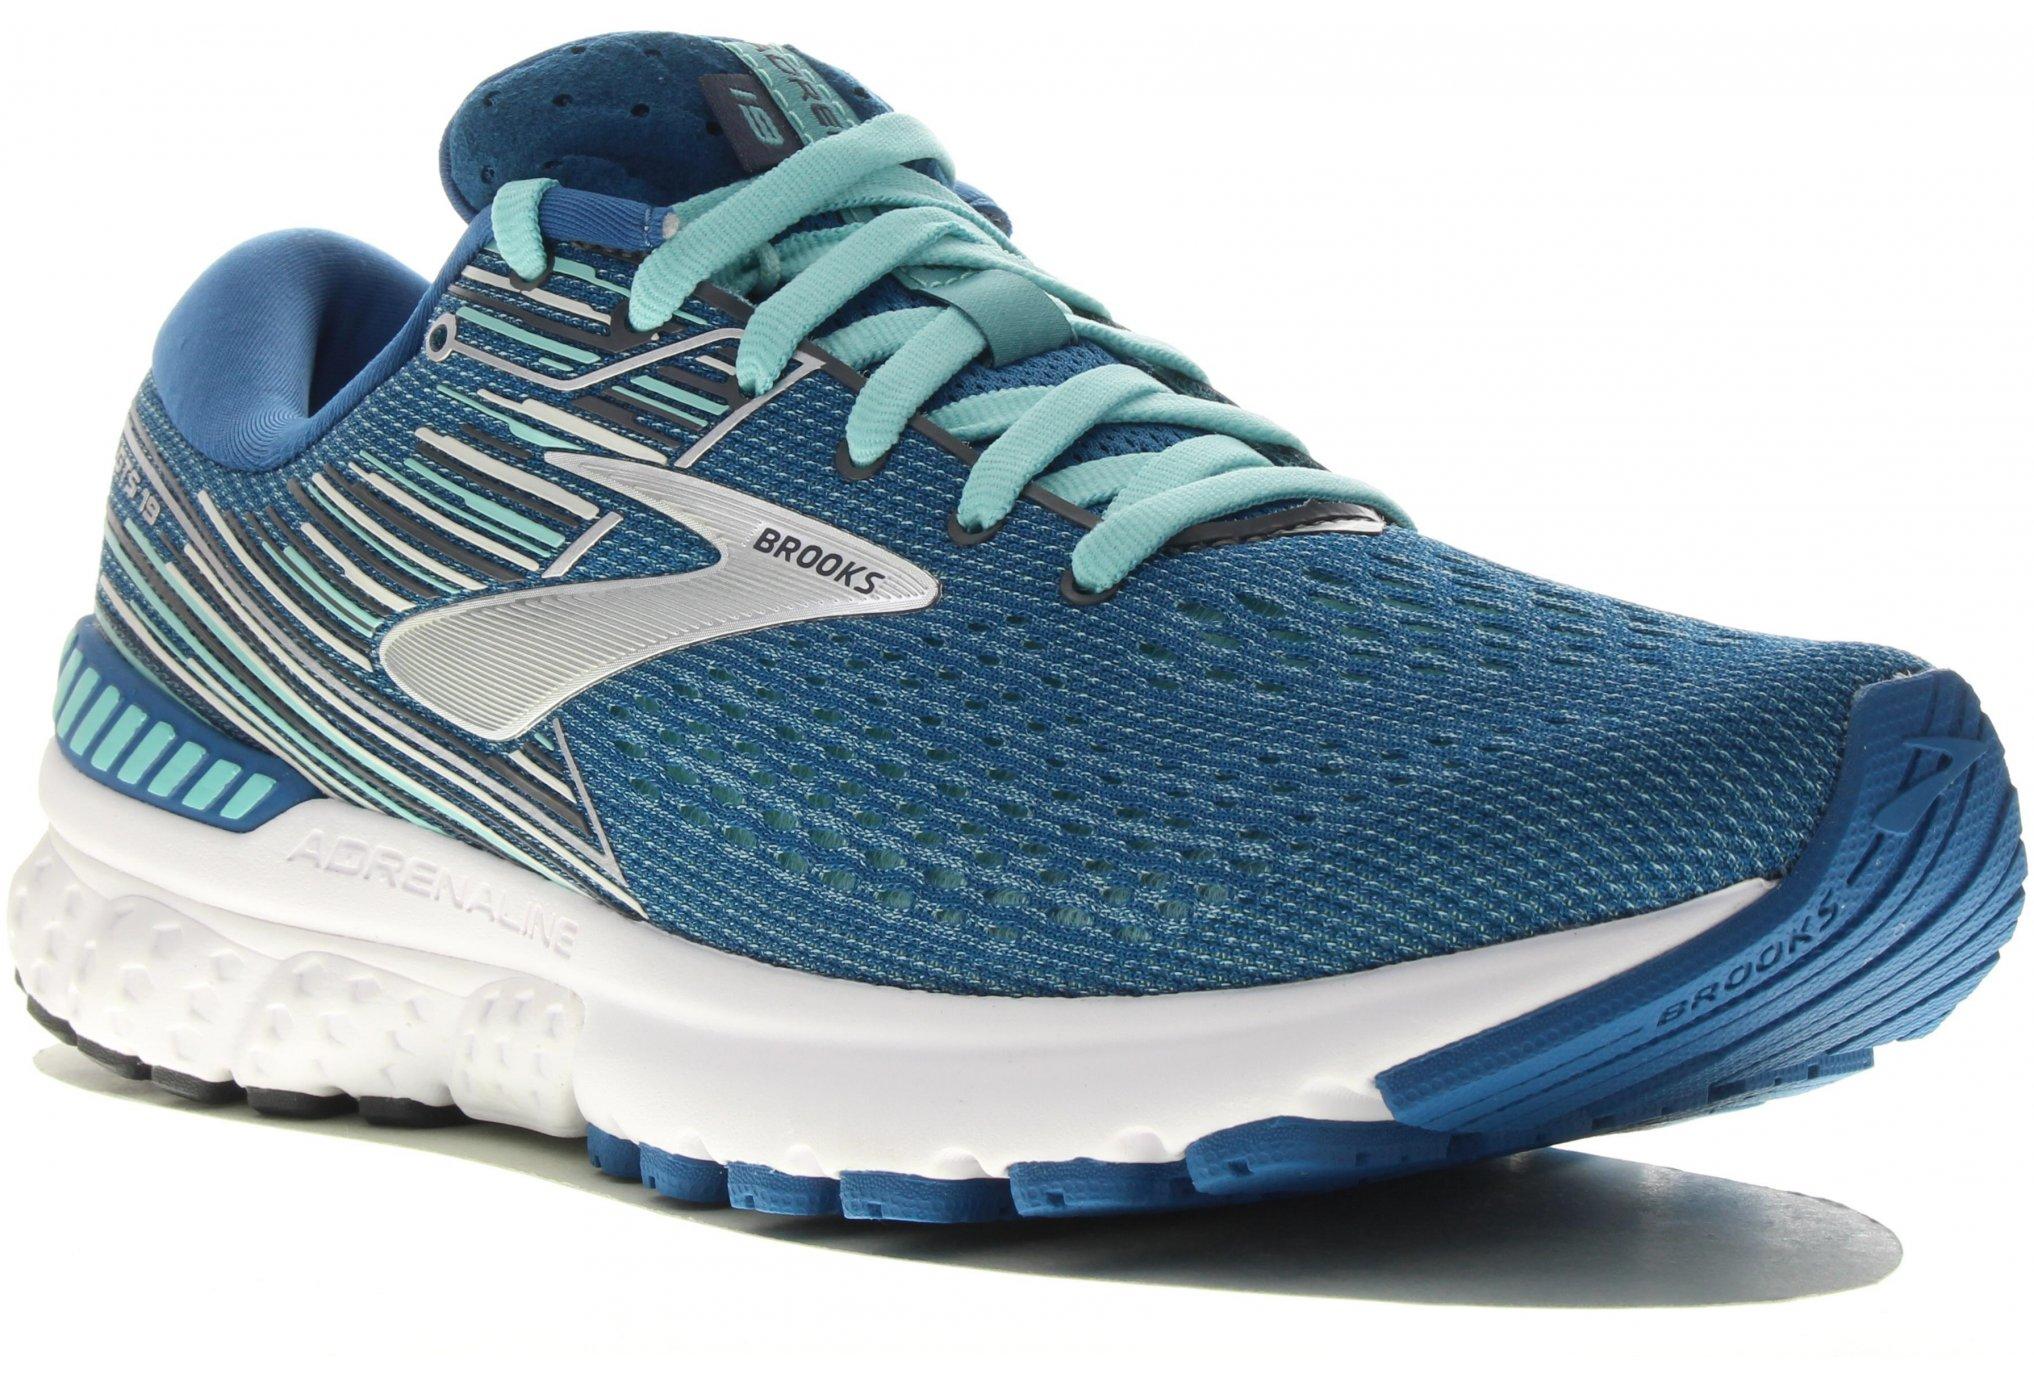 Brooks Adrenaline gts 19 w chaussures running femme